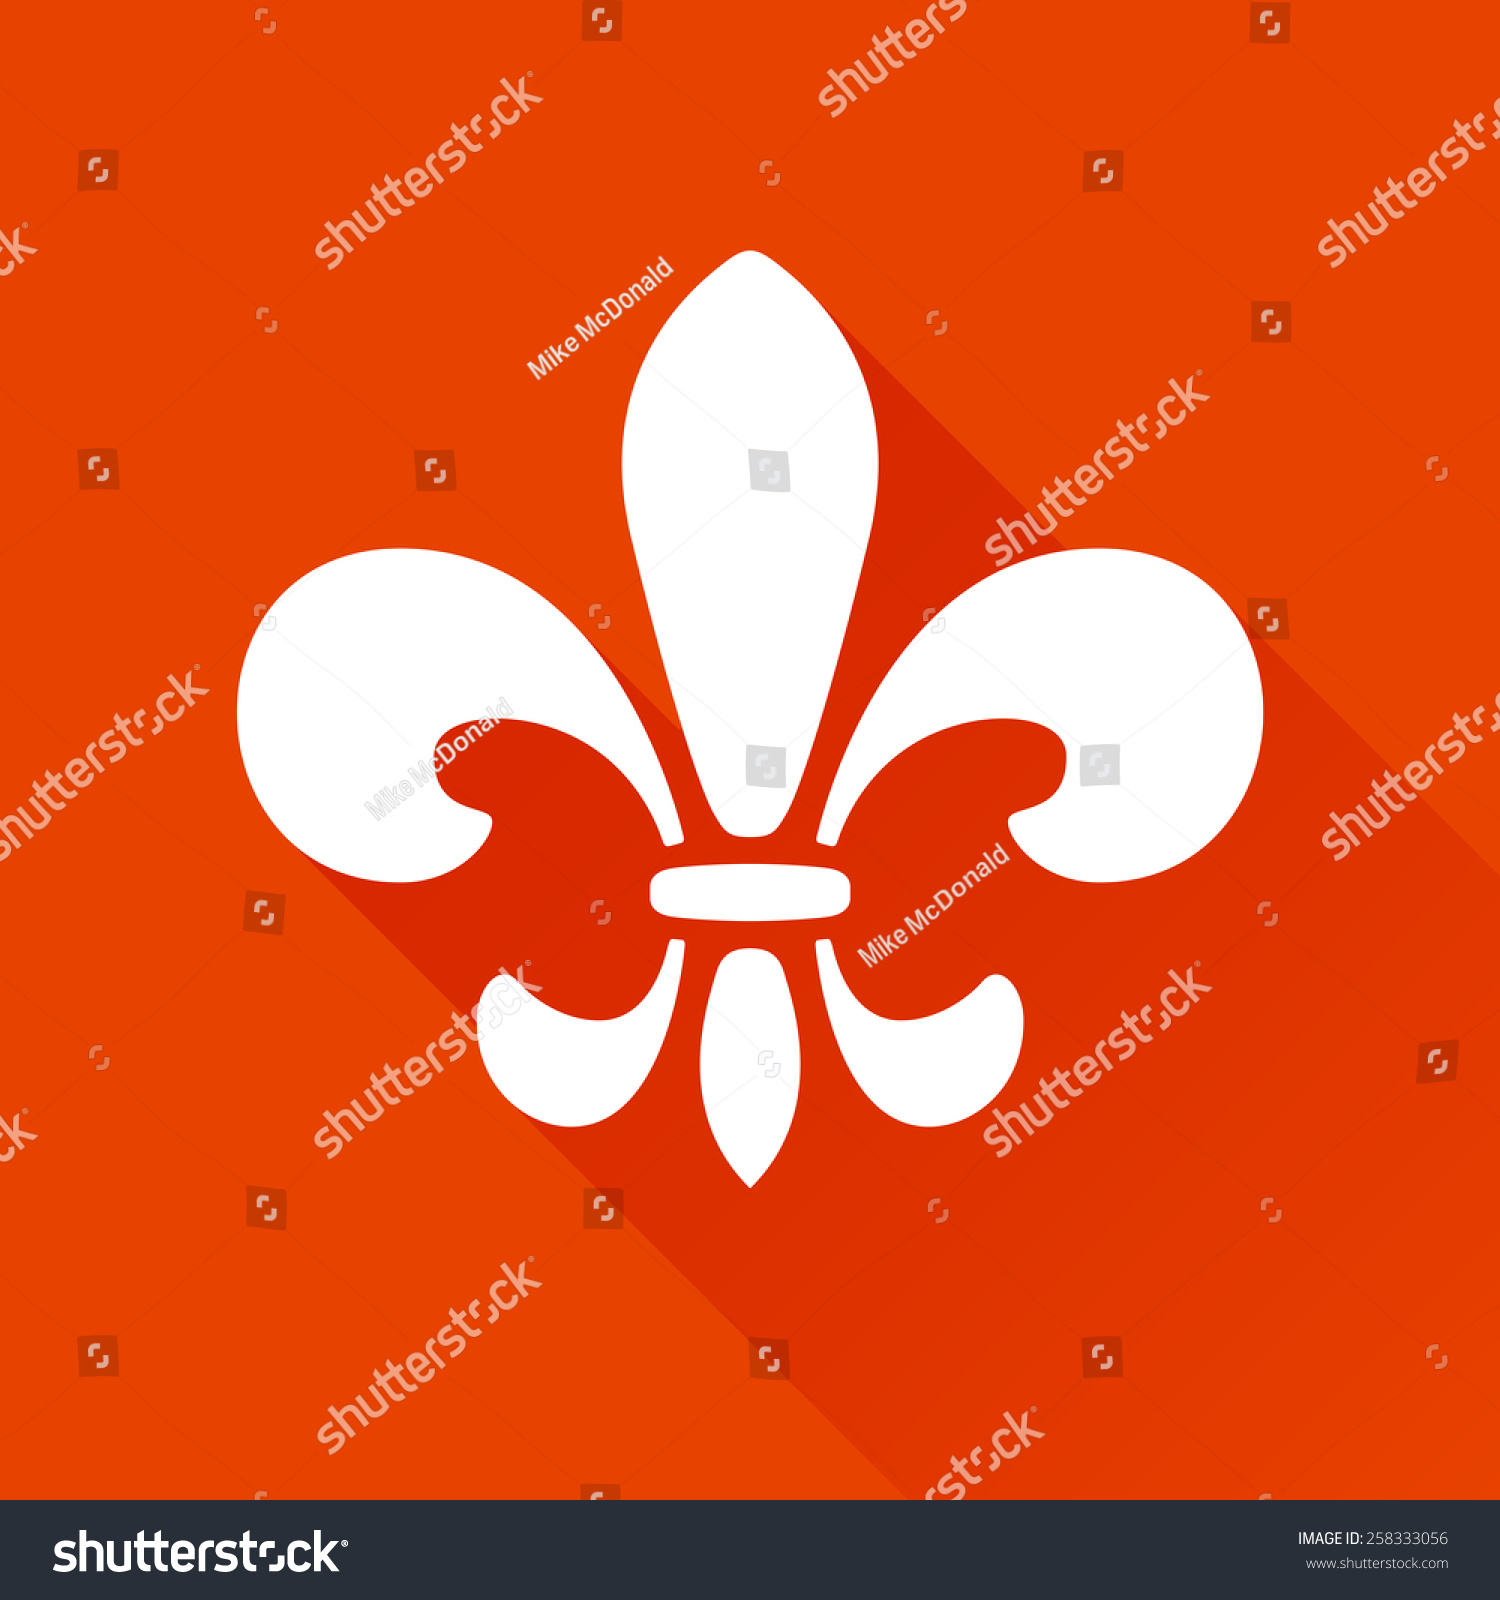 Fleur de lis graphic logo symbol stock vector 258333056 shutterstock fleur de lis graphic logo symbol with long shadow biocorpaavc